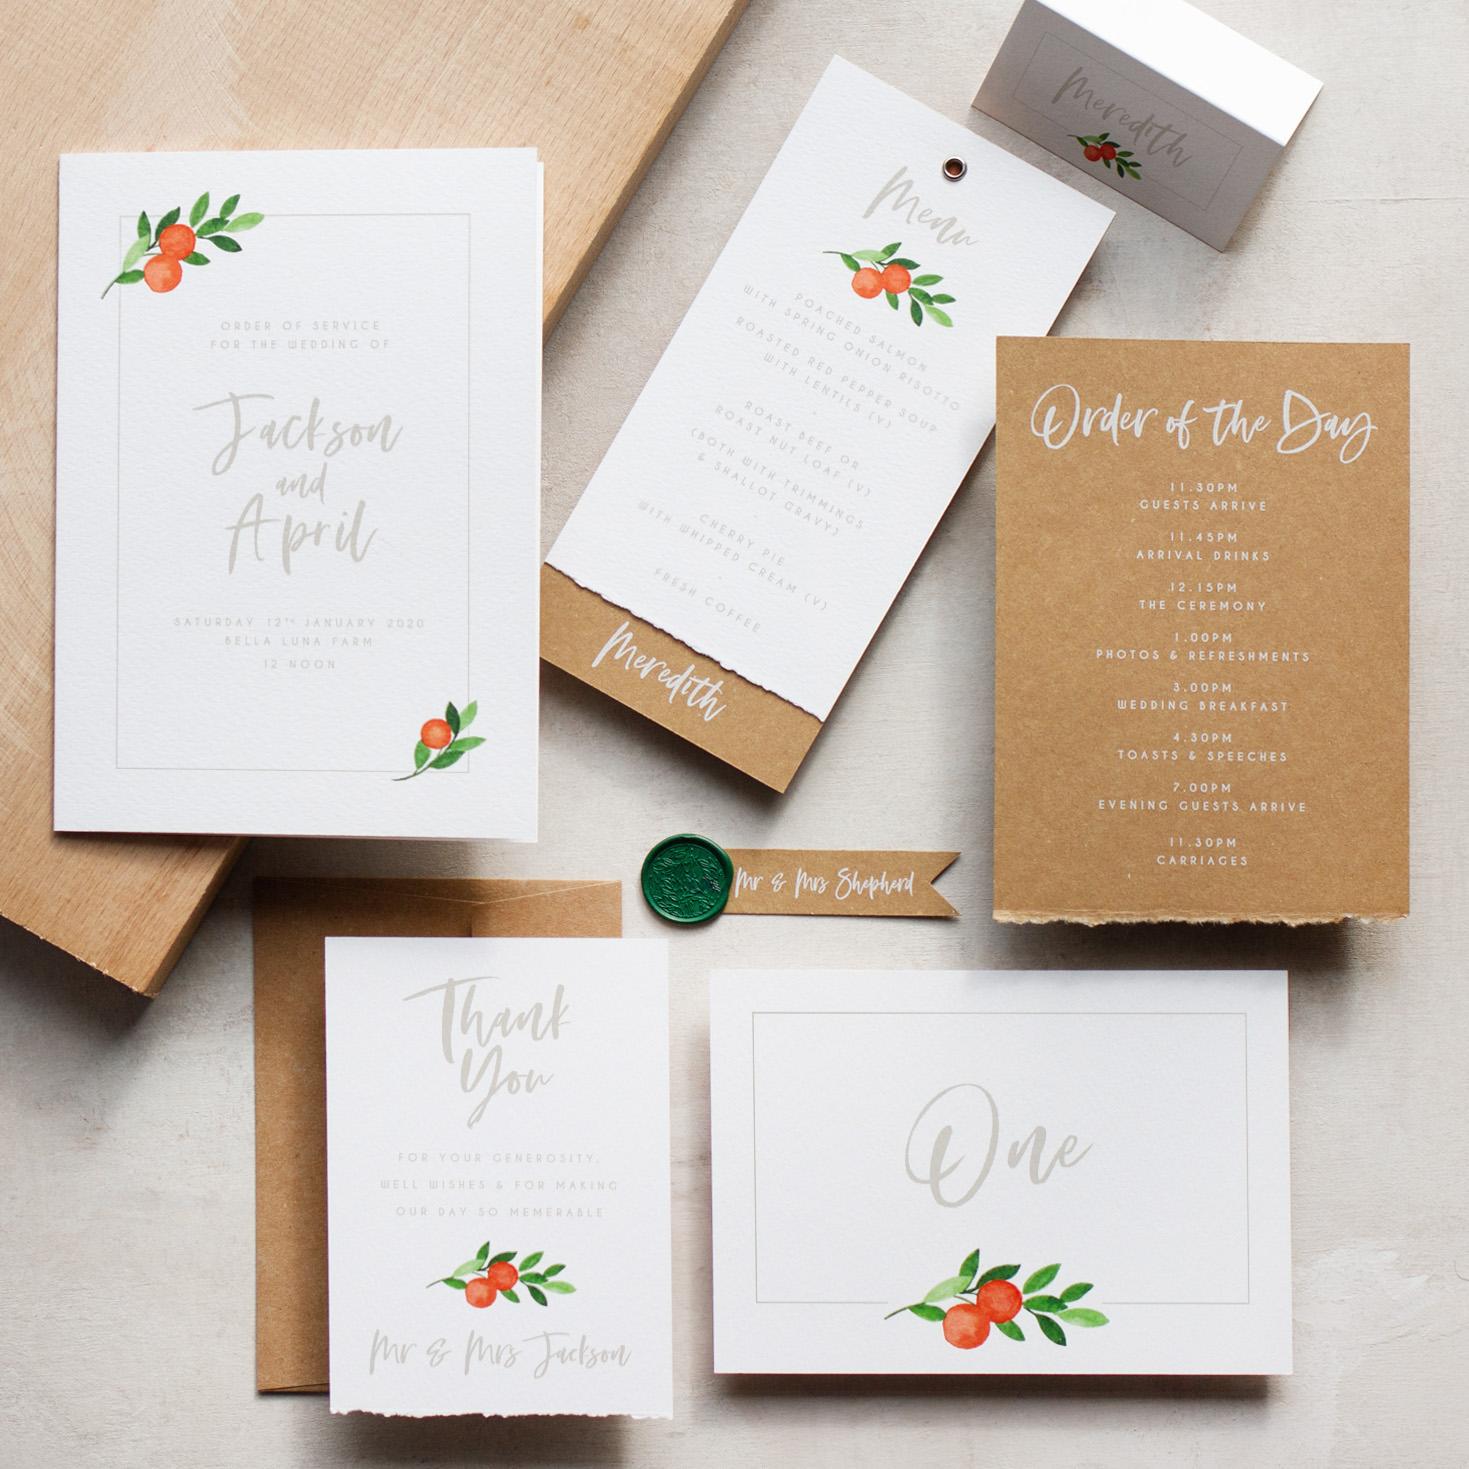 Citrus Orange Wedding Decor, Earthy and Luxury, Eco Friendly Wedding Stationery, Orange Wedding Decor, Watercolour Wedding Staionery, Custom Wedding Stationery 12.jpg